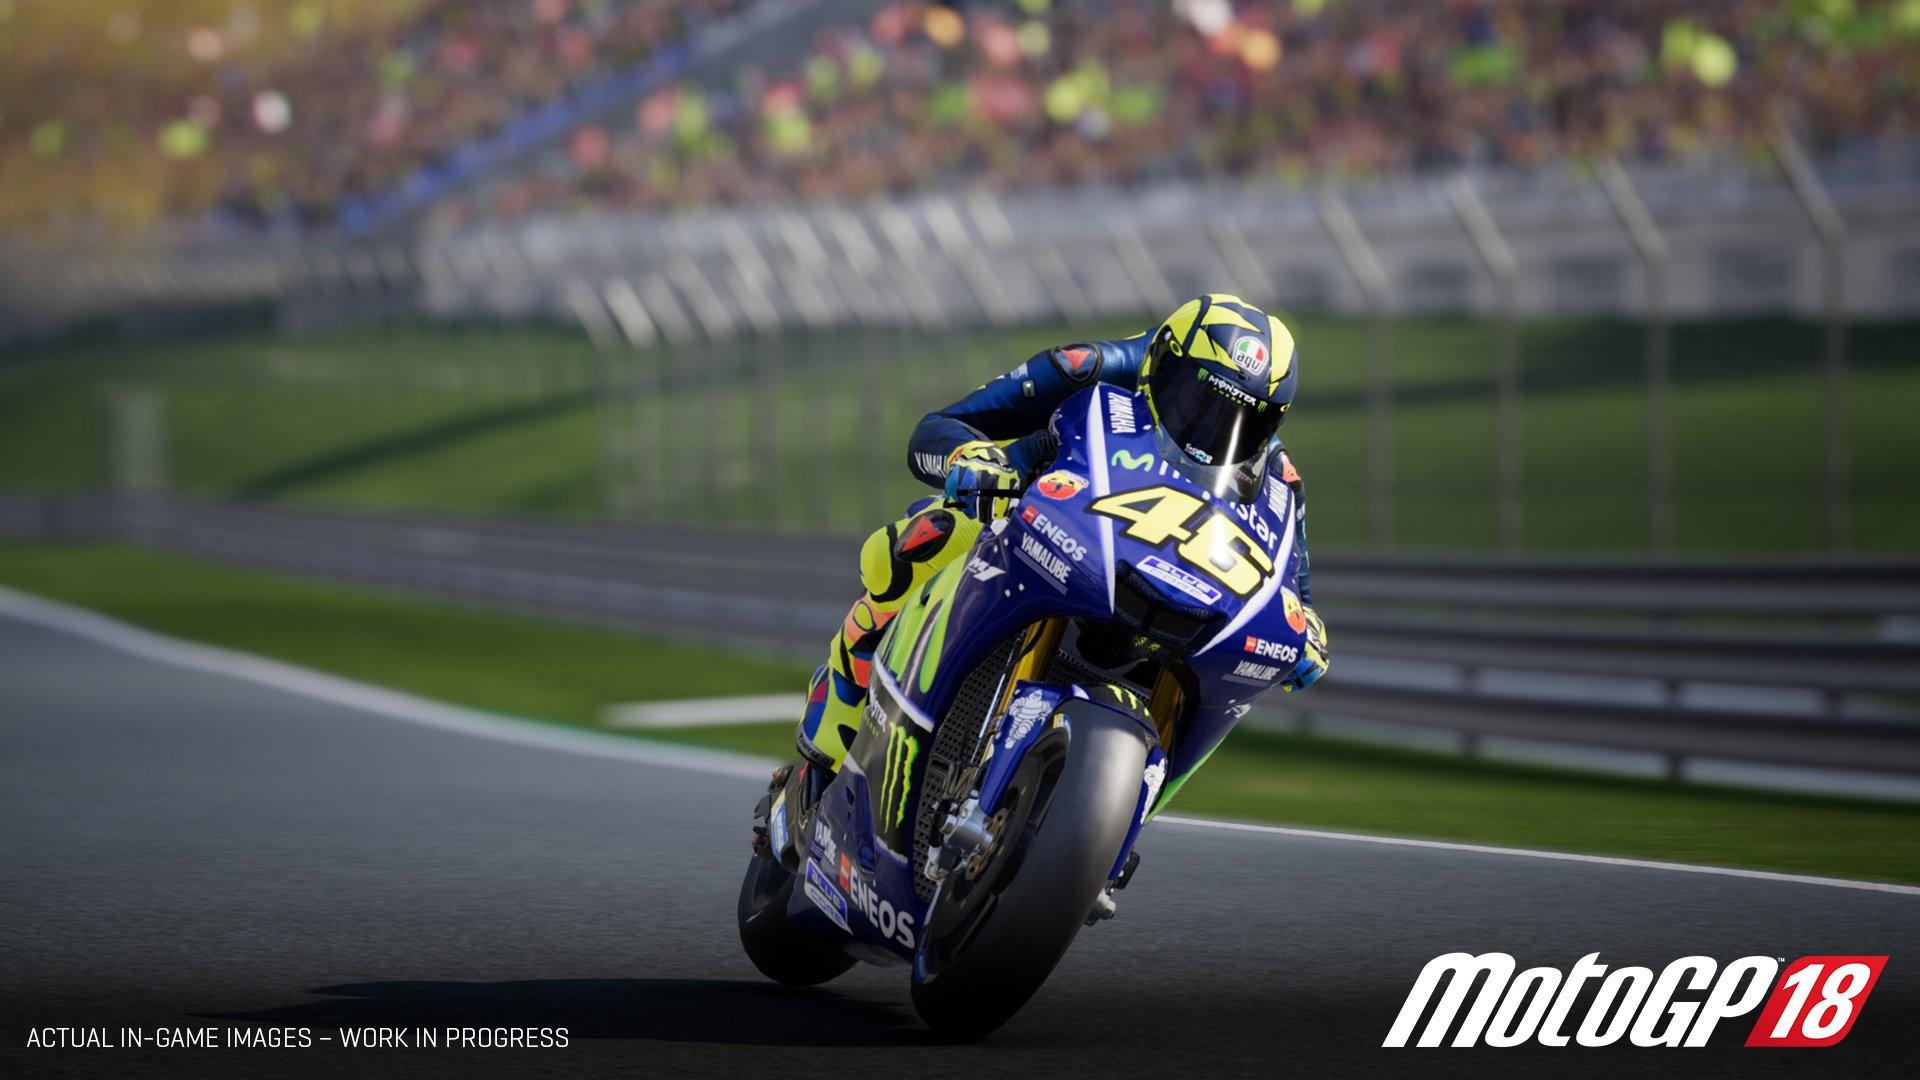 MotoGP 18 preview 9